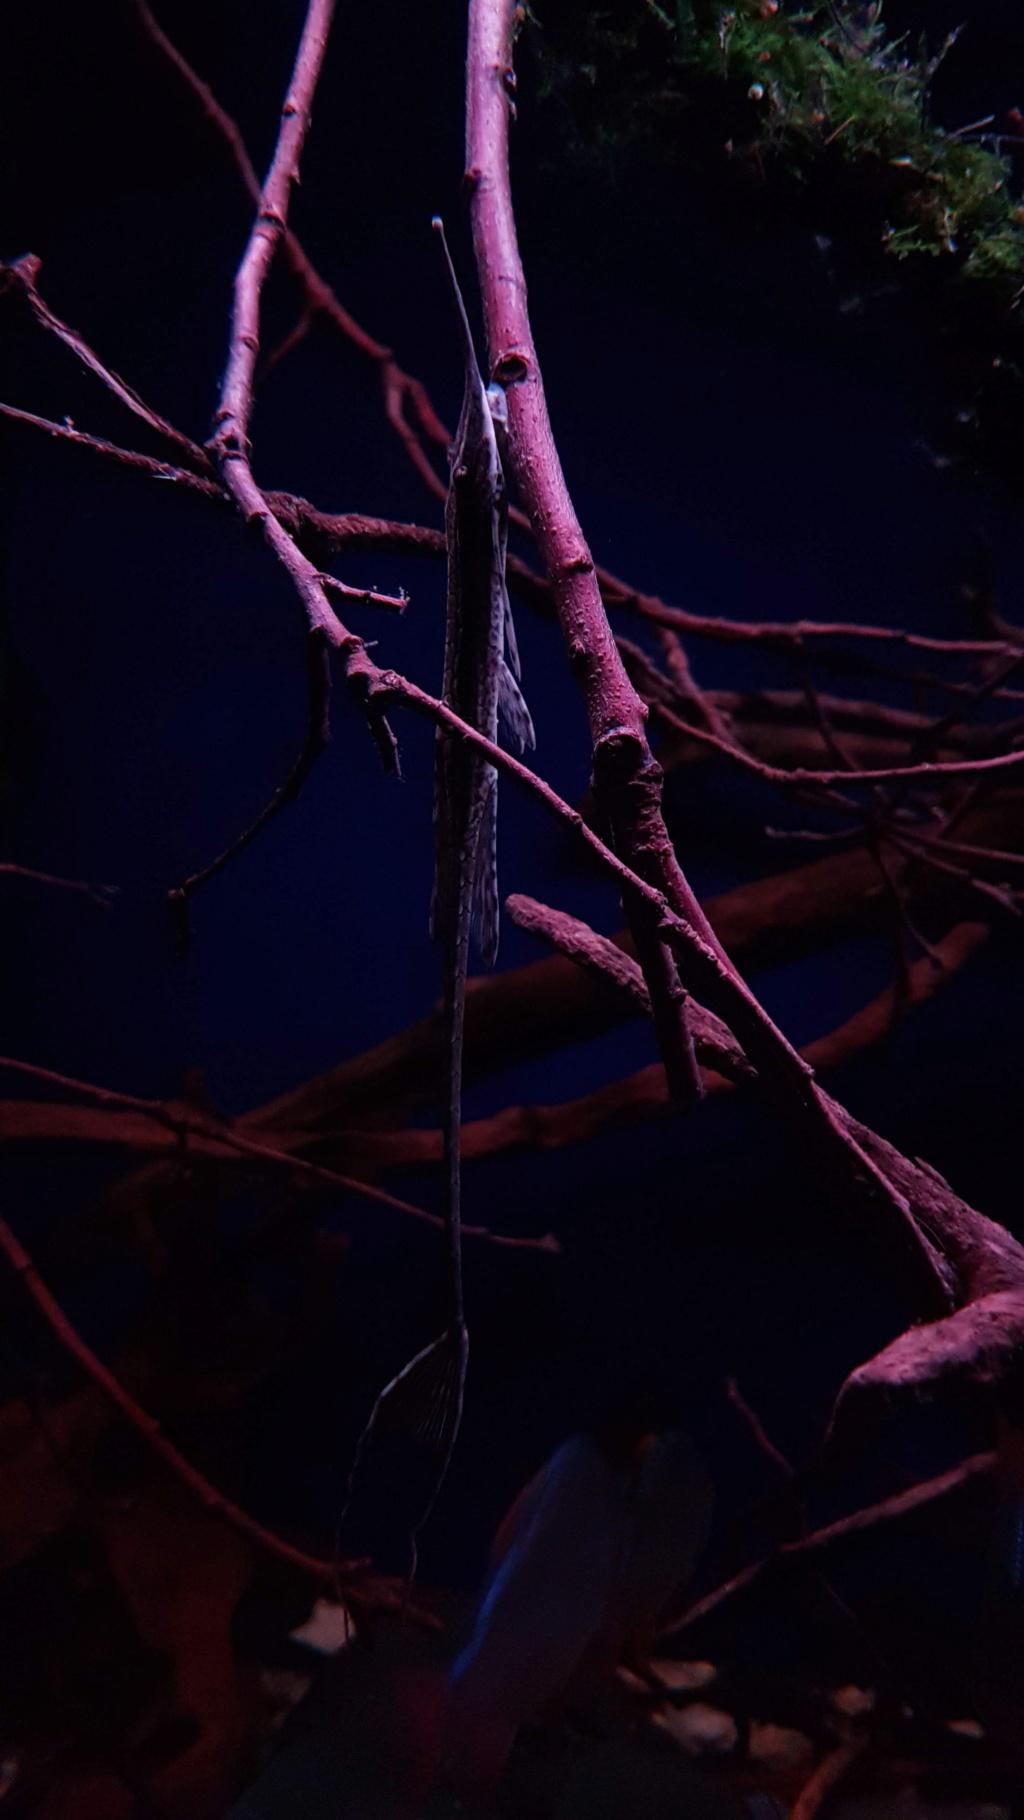 Farlowella platorynchus  - Retzer & Page, 1997 - Pez gato varilla -  20181027